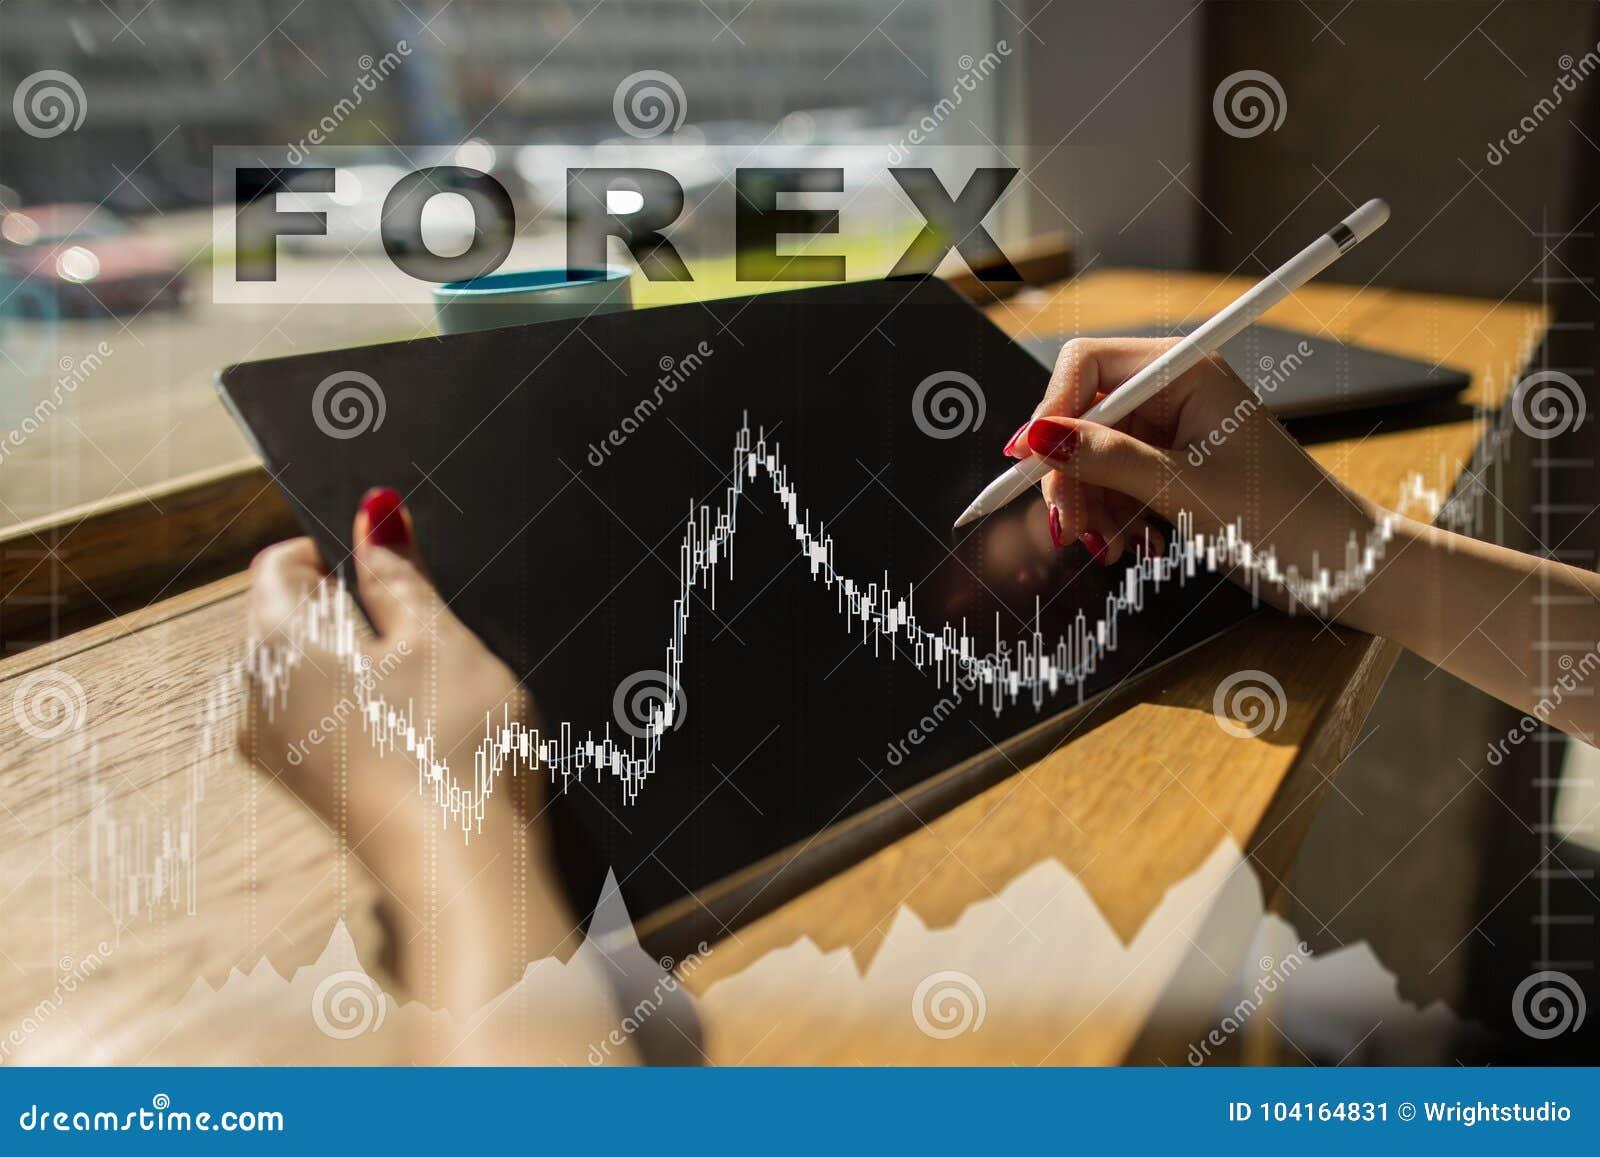 How to Open Forex Broker, Forex Broker - Evan Technology